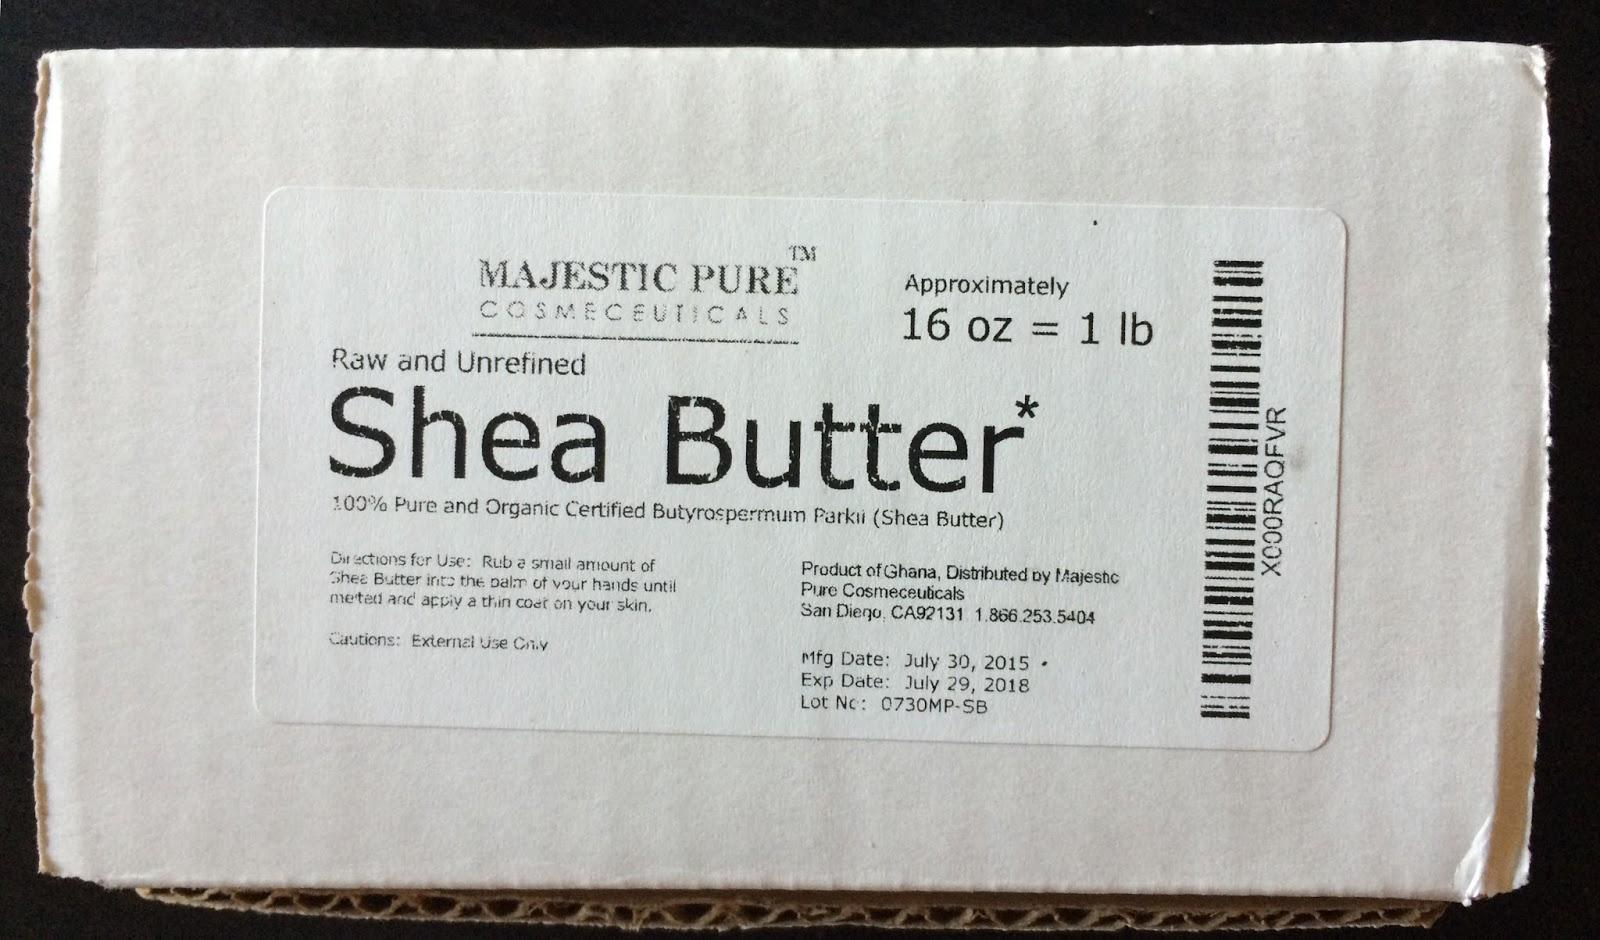 shea butter skincare